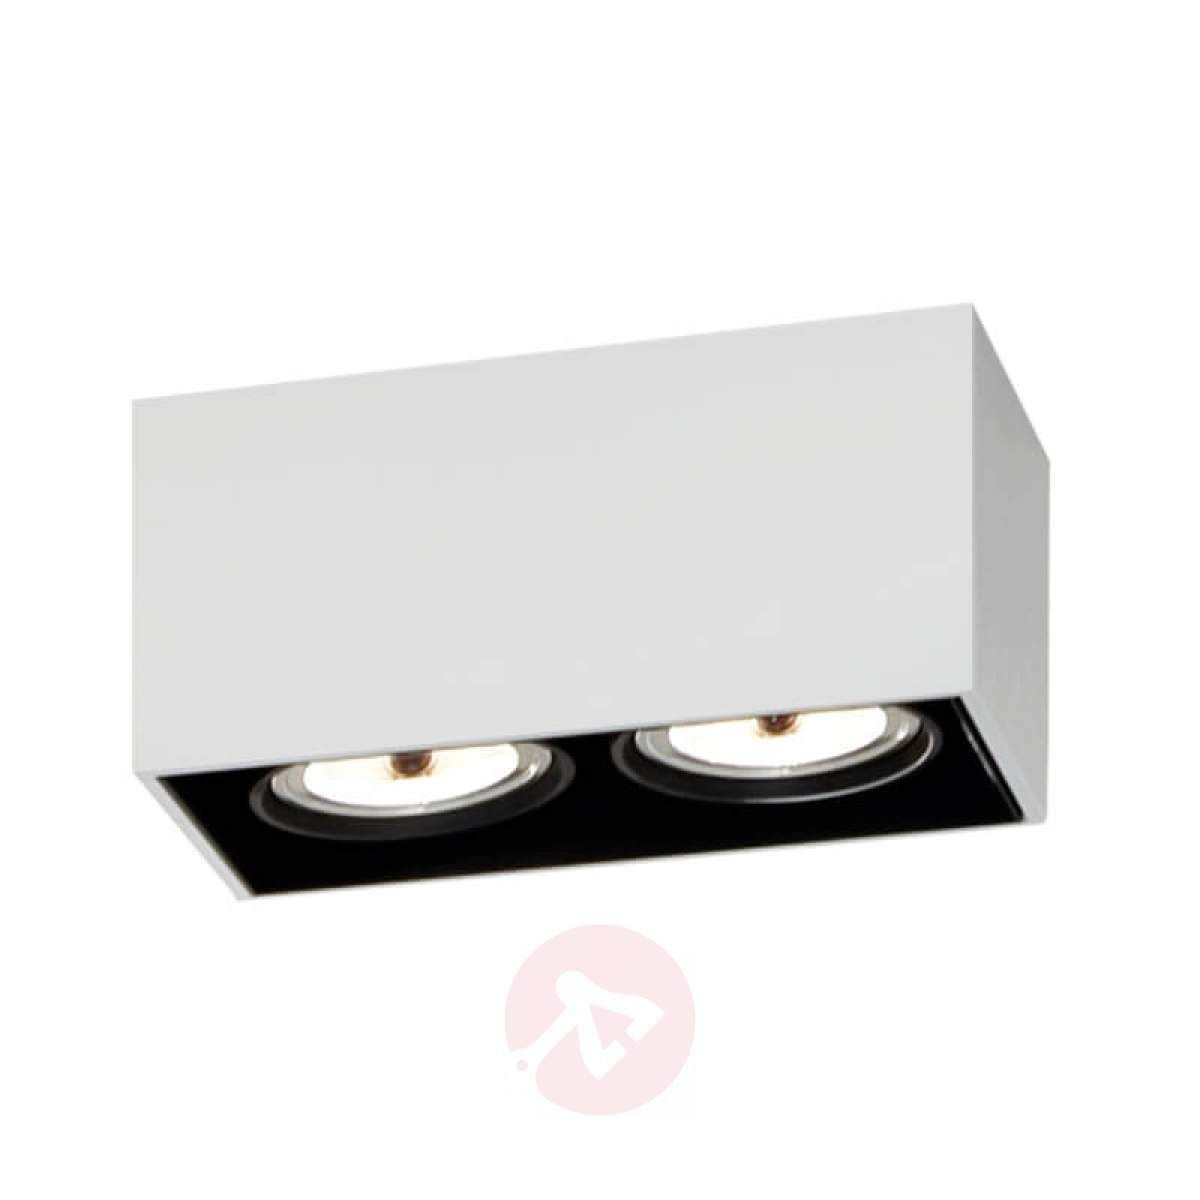 2 Punktowa Lampa Sufitowa Compass Box Biała In 2019 Lampy